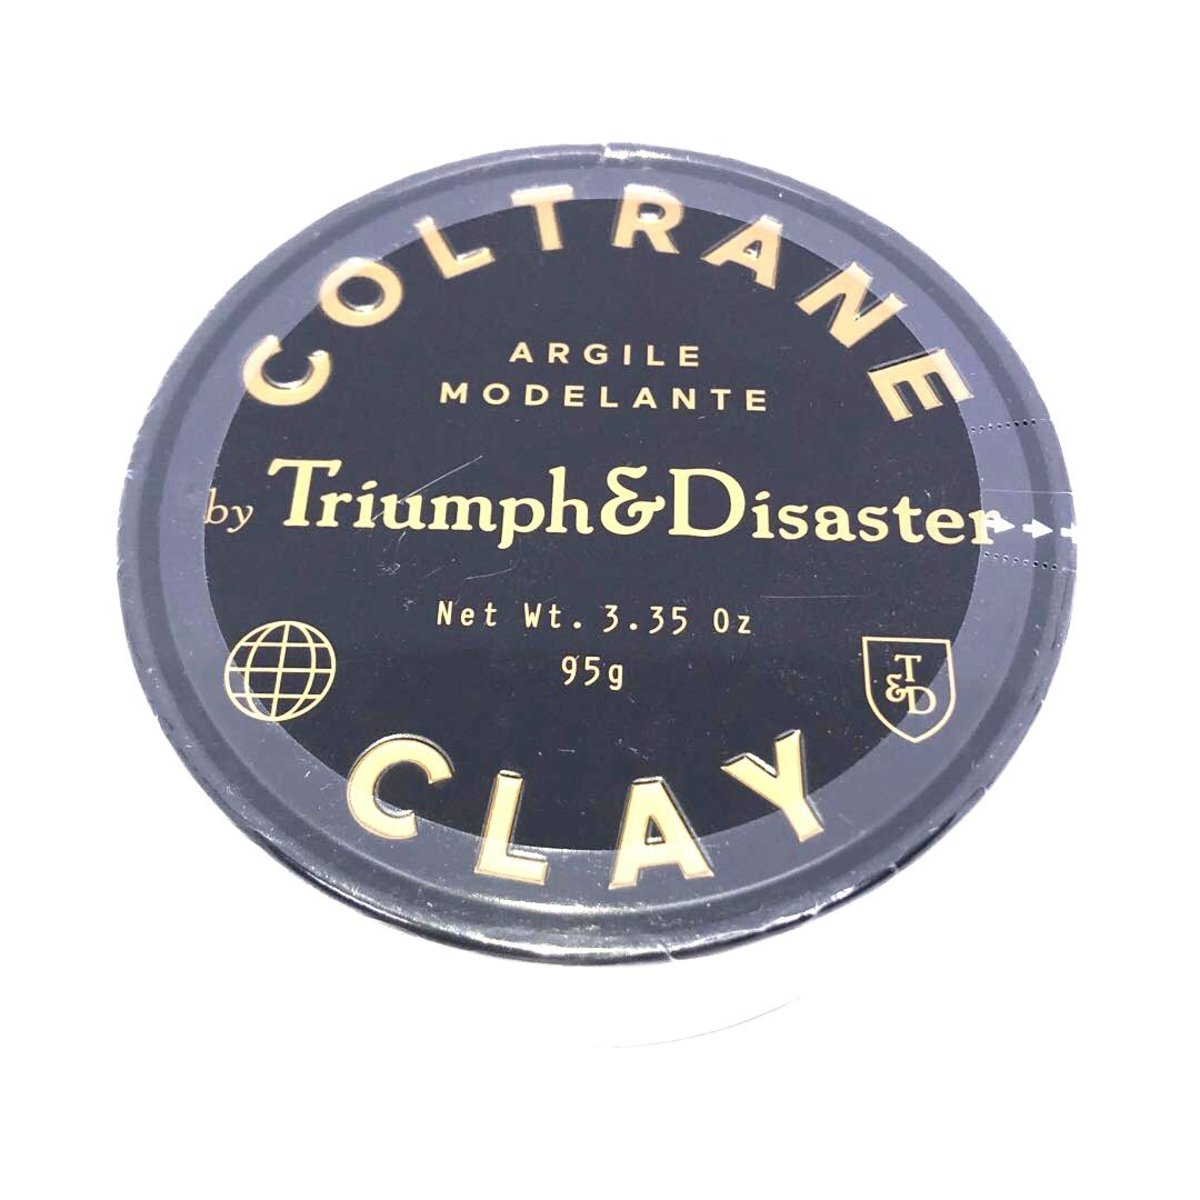 臭美男髪膏Triumph & Disaster Colntrane Clay 95G